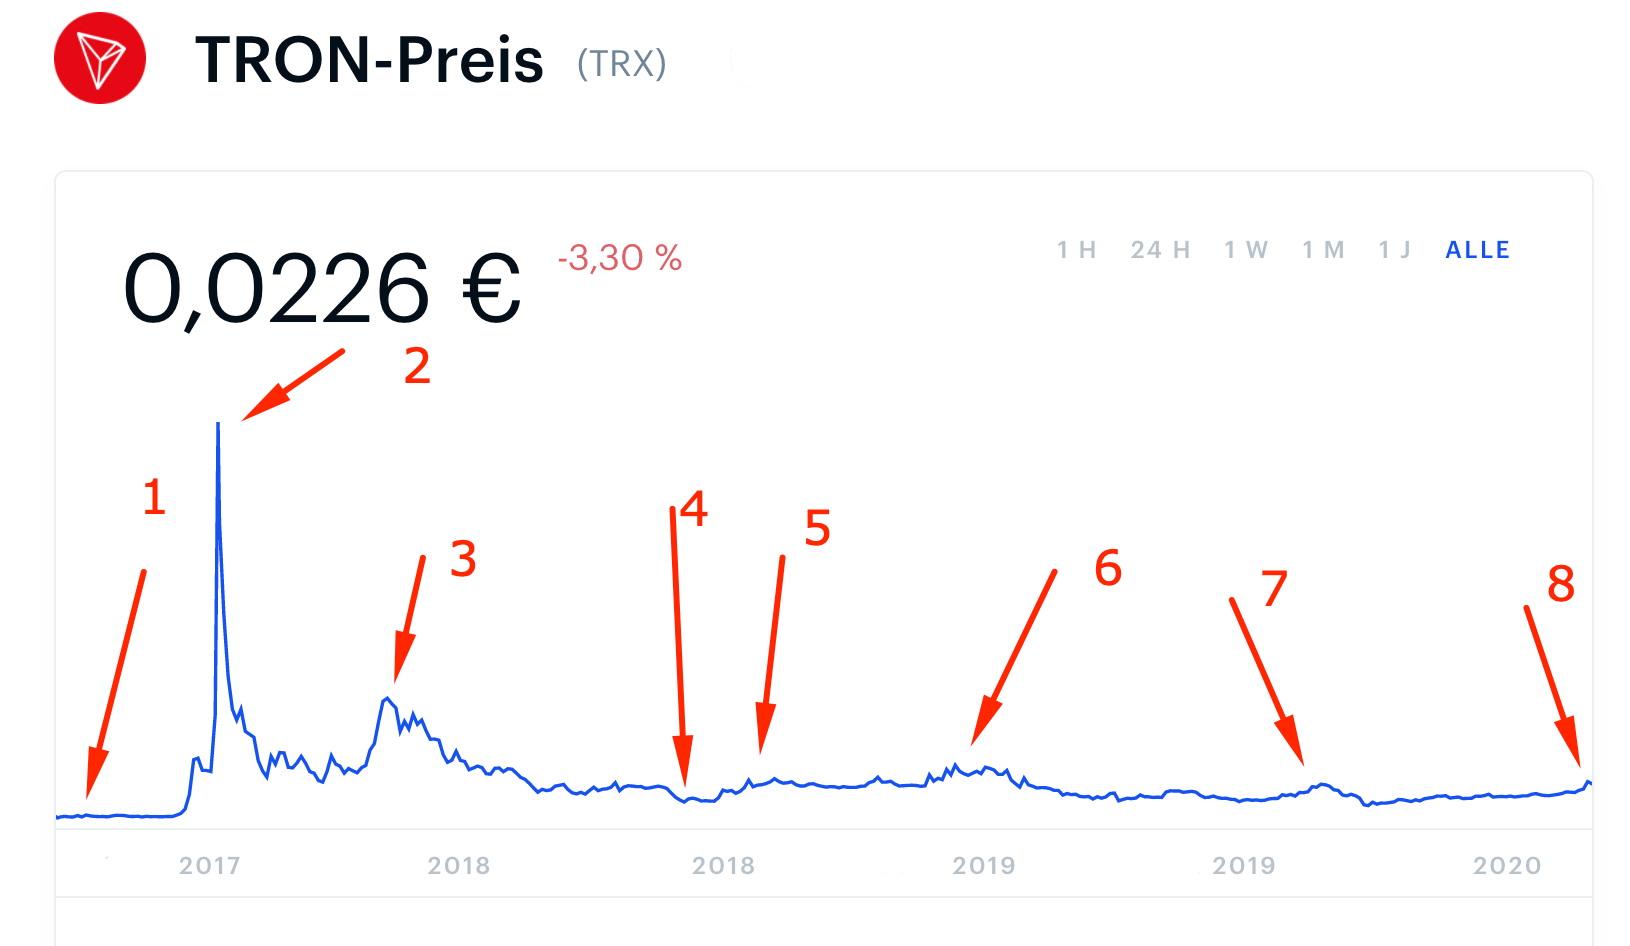 Tron share price